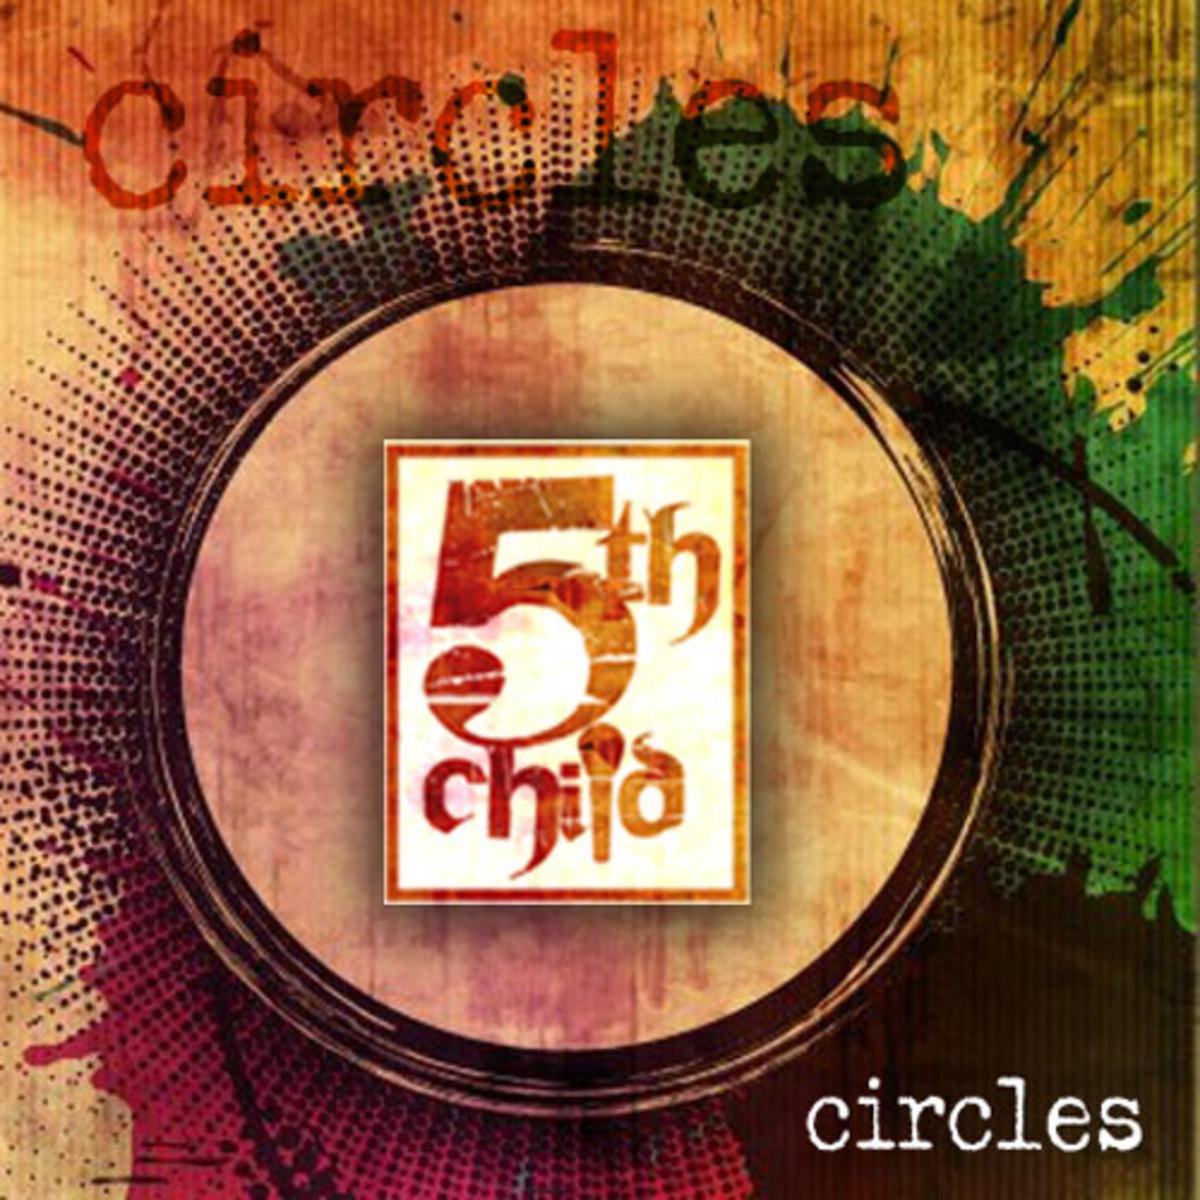 5thchild-circles.jpg